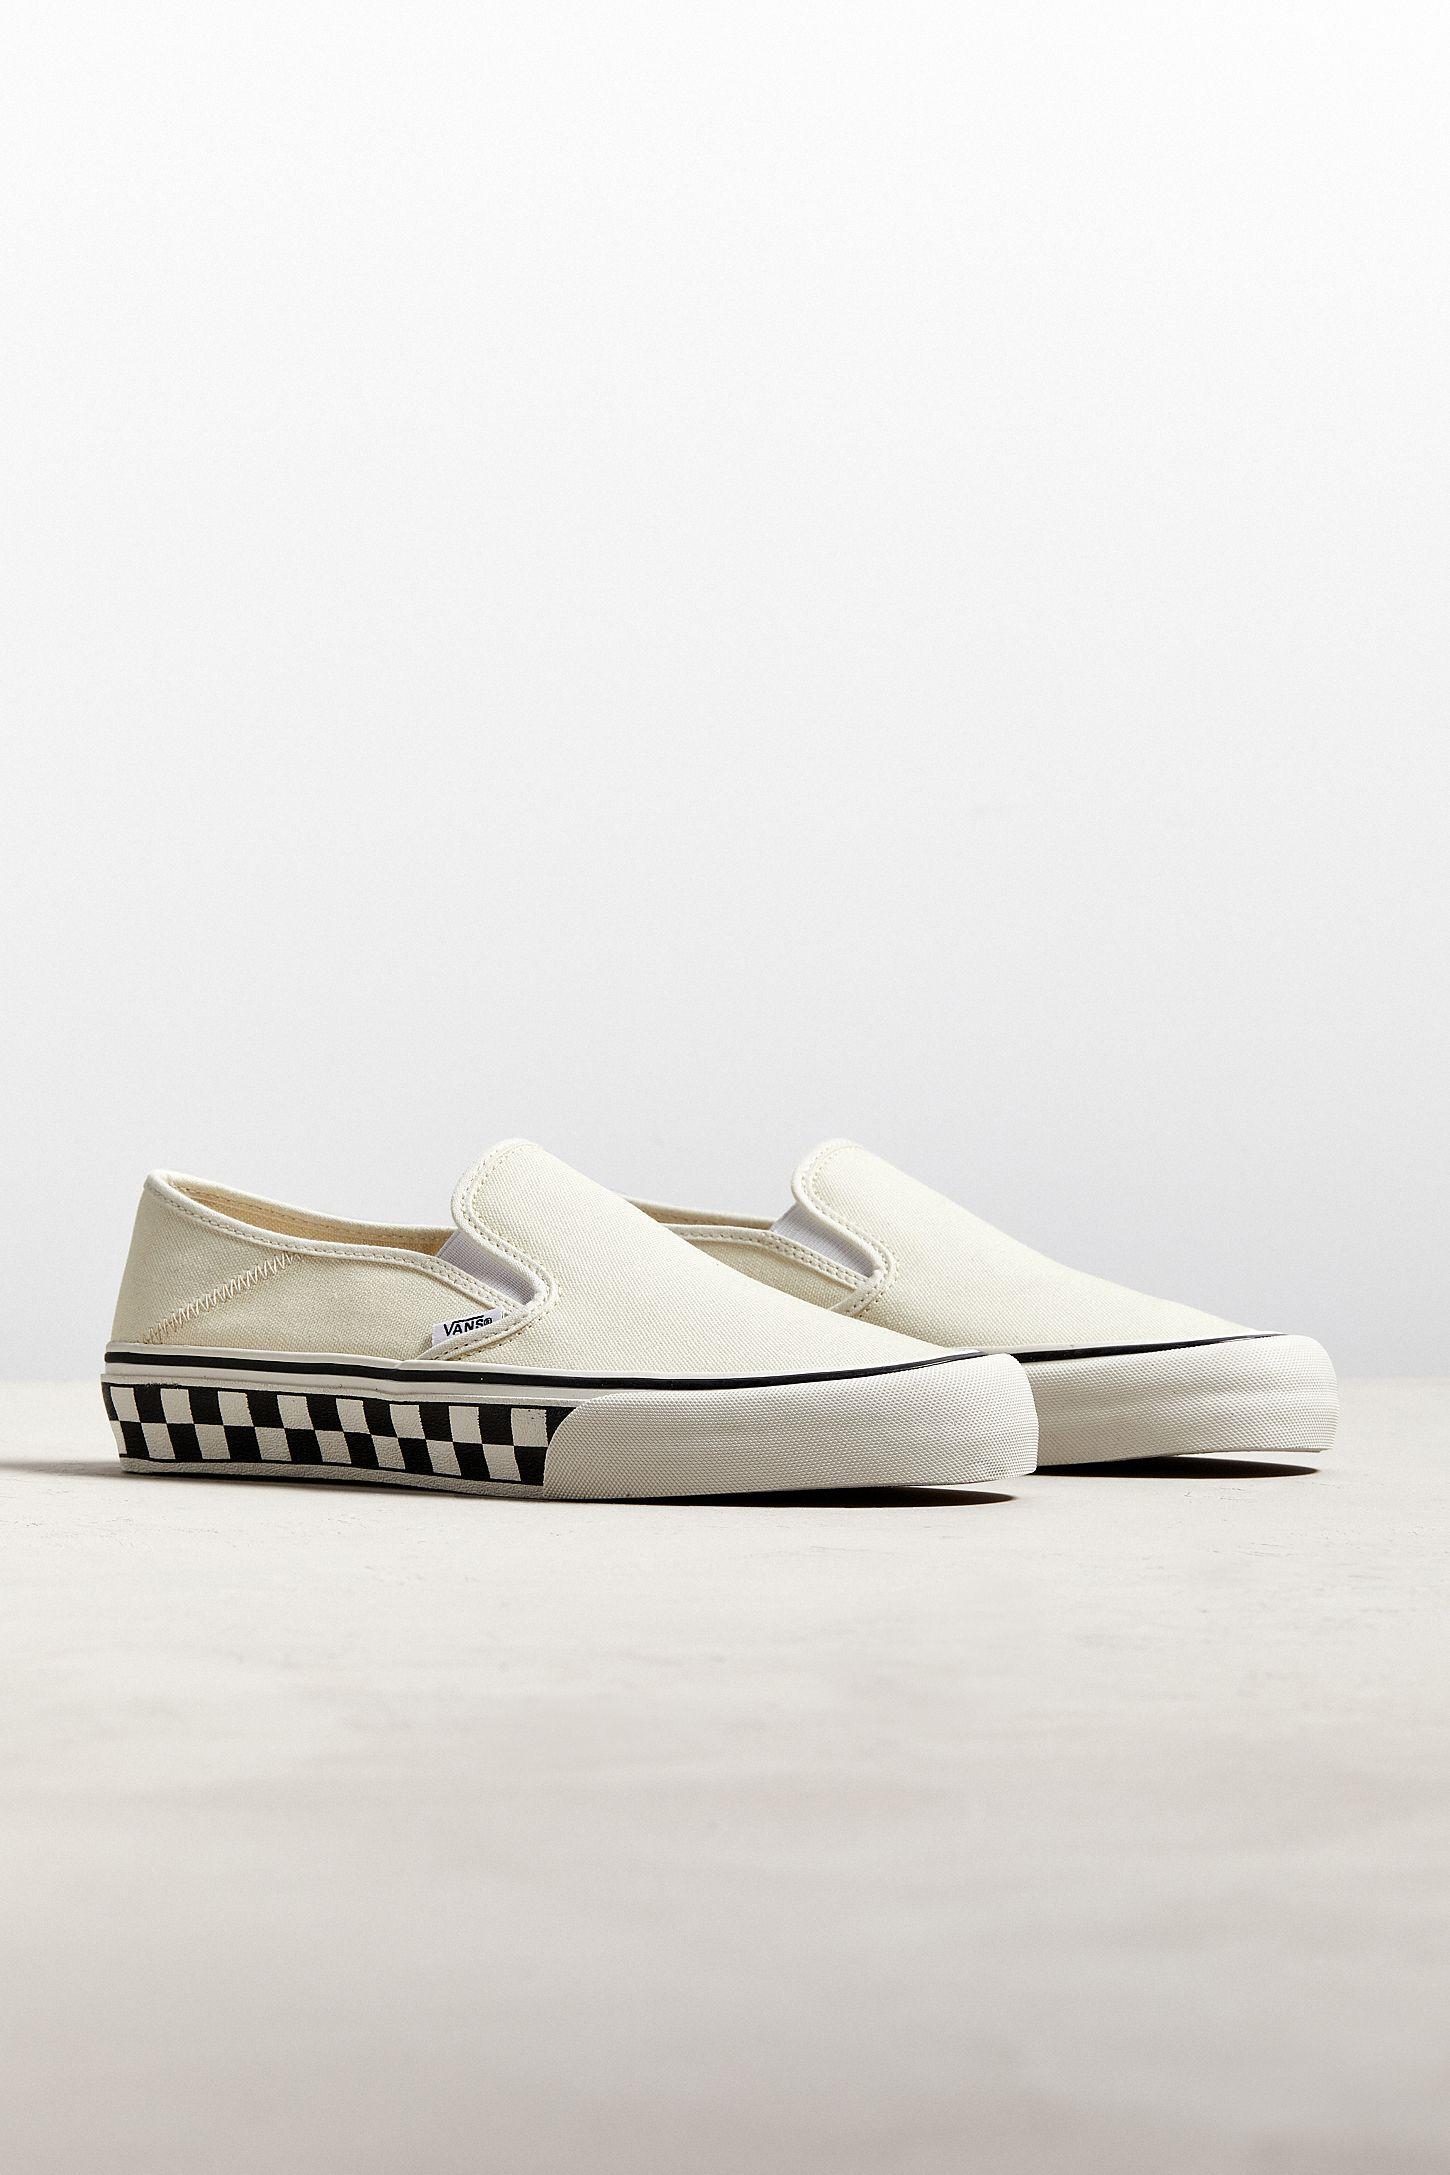 c36ad5a75a Vans Slip-On SF Checkerboard Sneaker